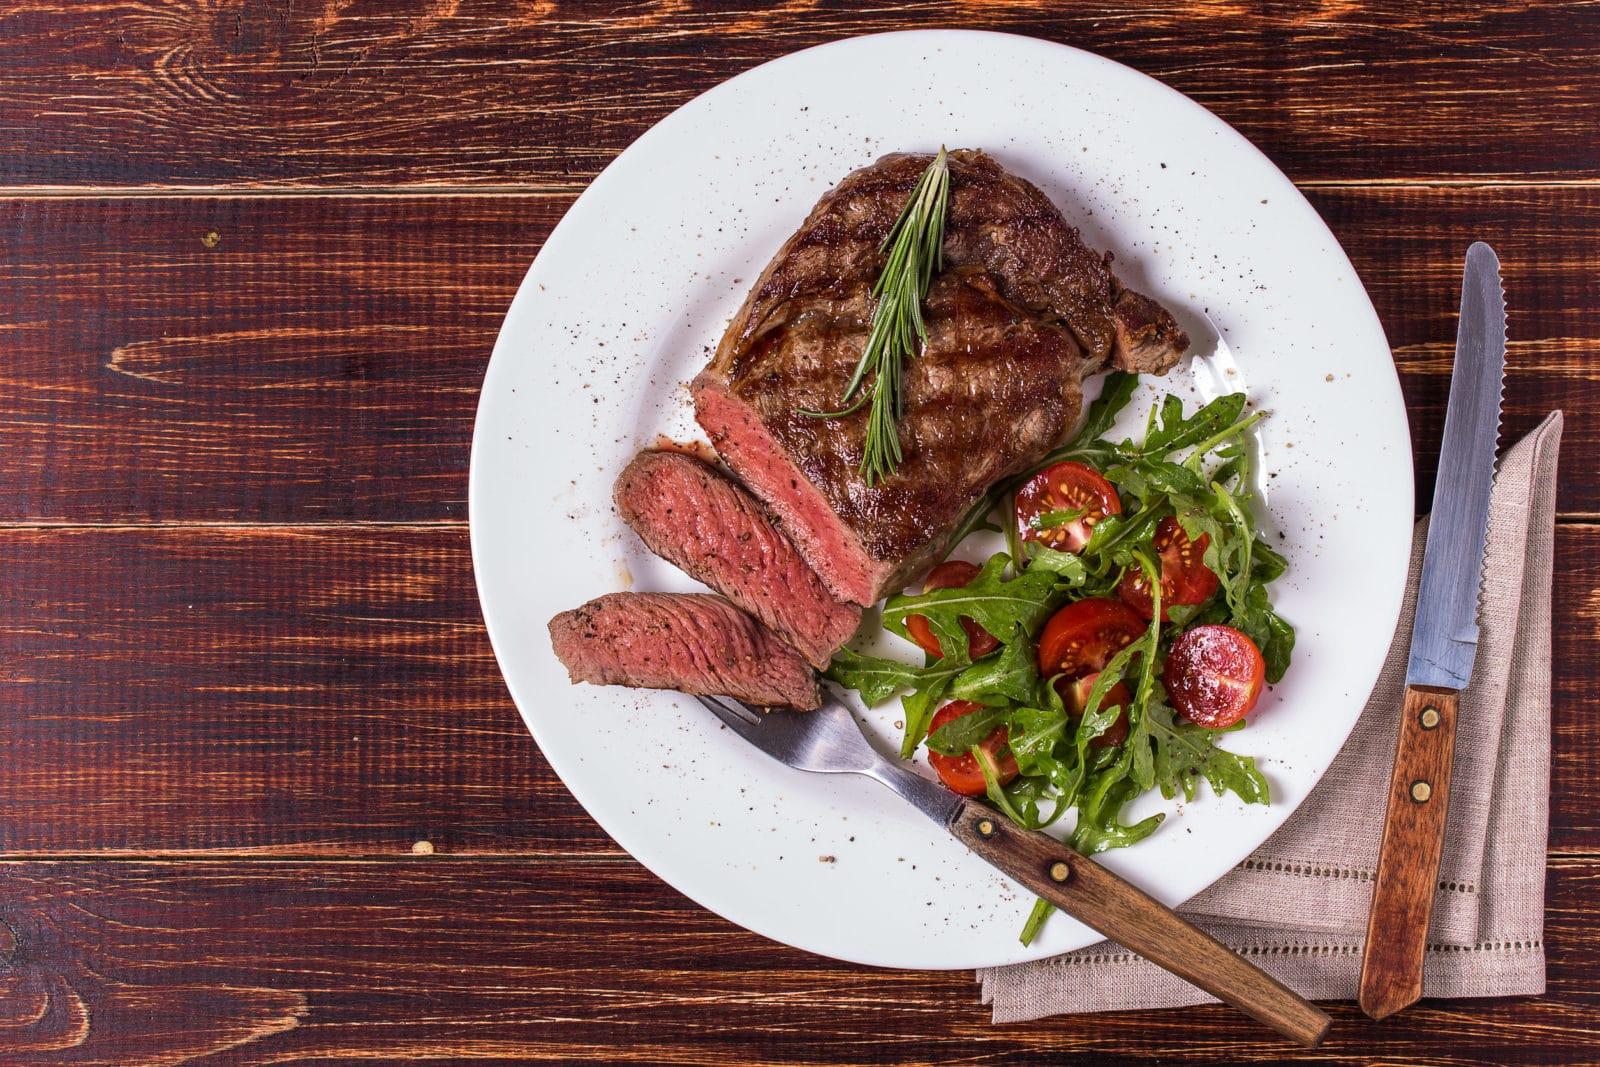 białko tłumi apetyt